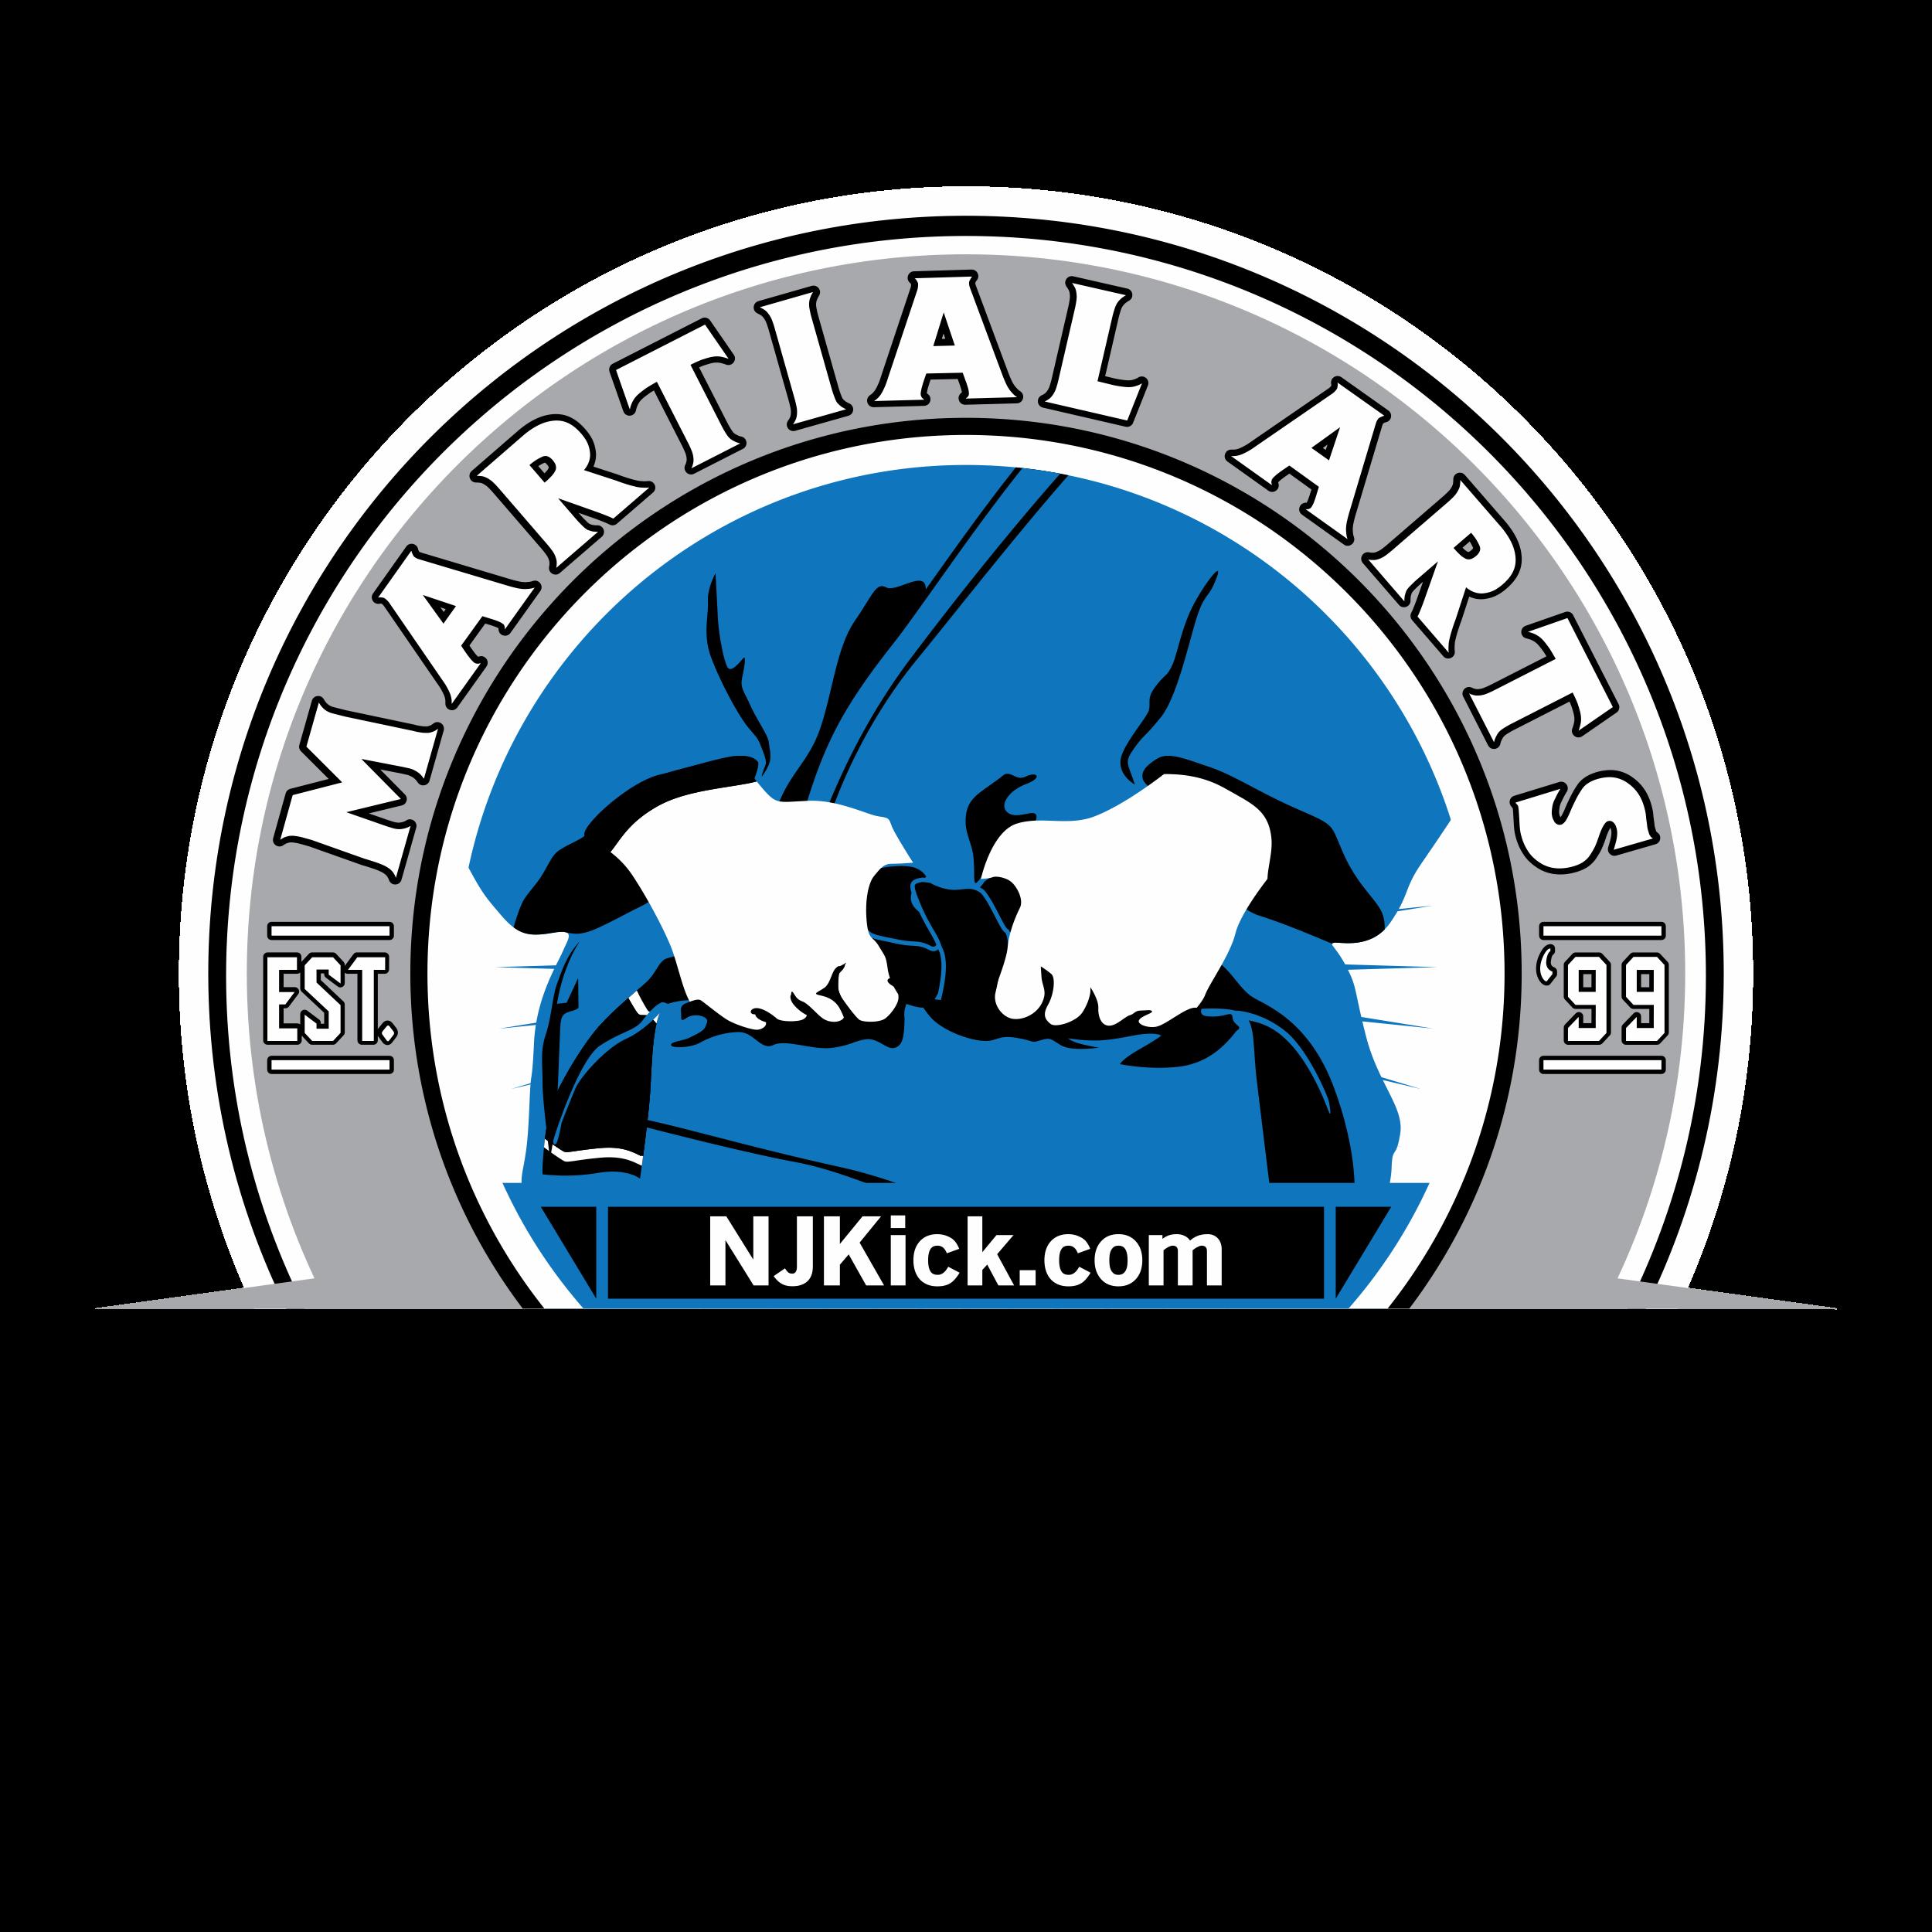 Guerrero Martial Arts Caldwell Logo Transparant 1, Guerrero Martial Arts in Caldwell, NJ